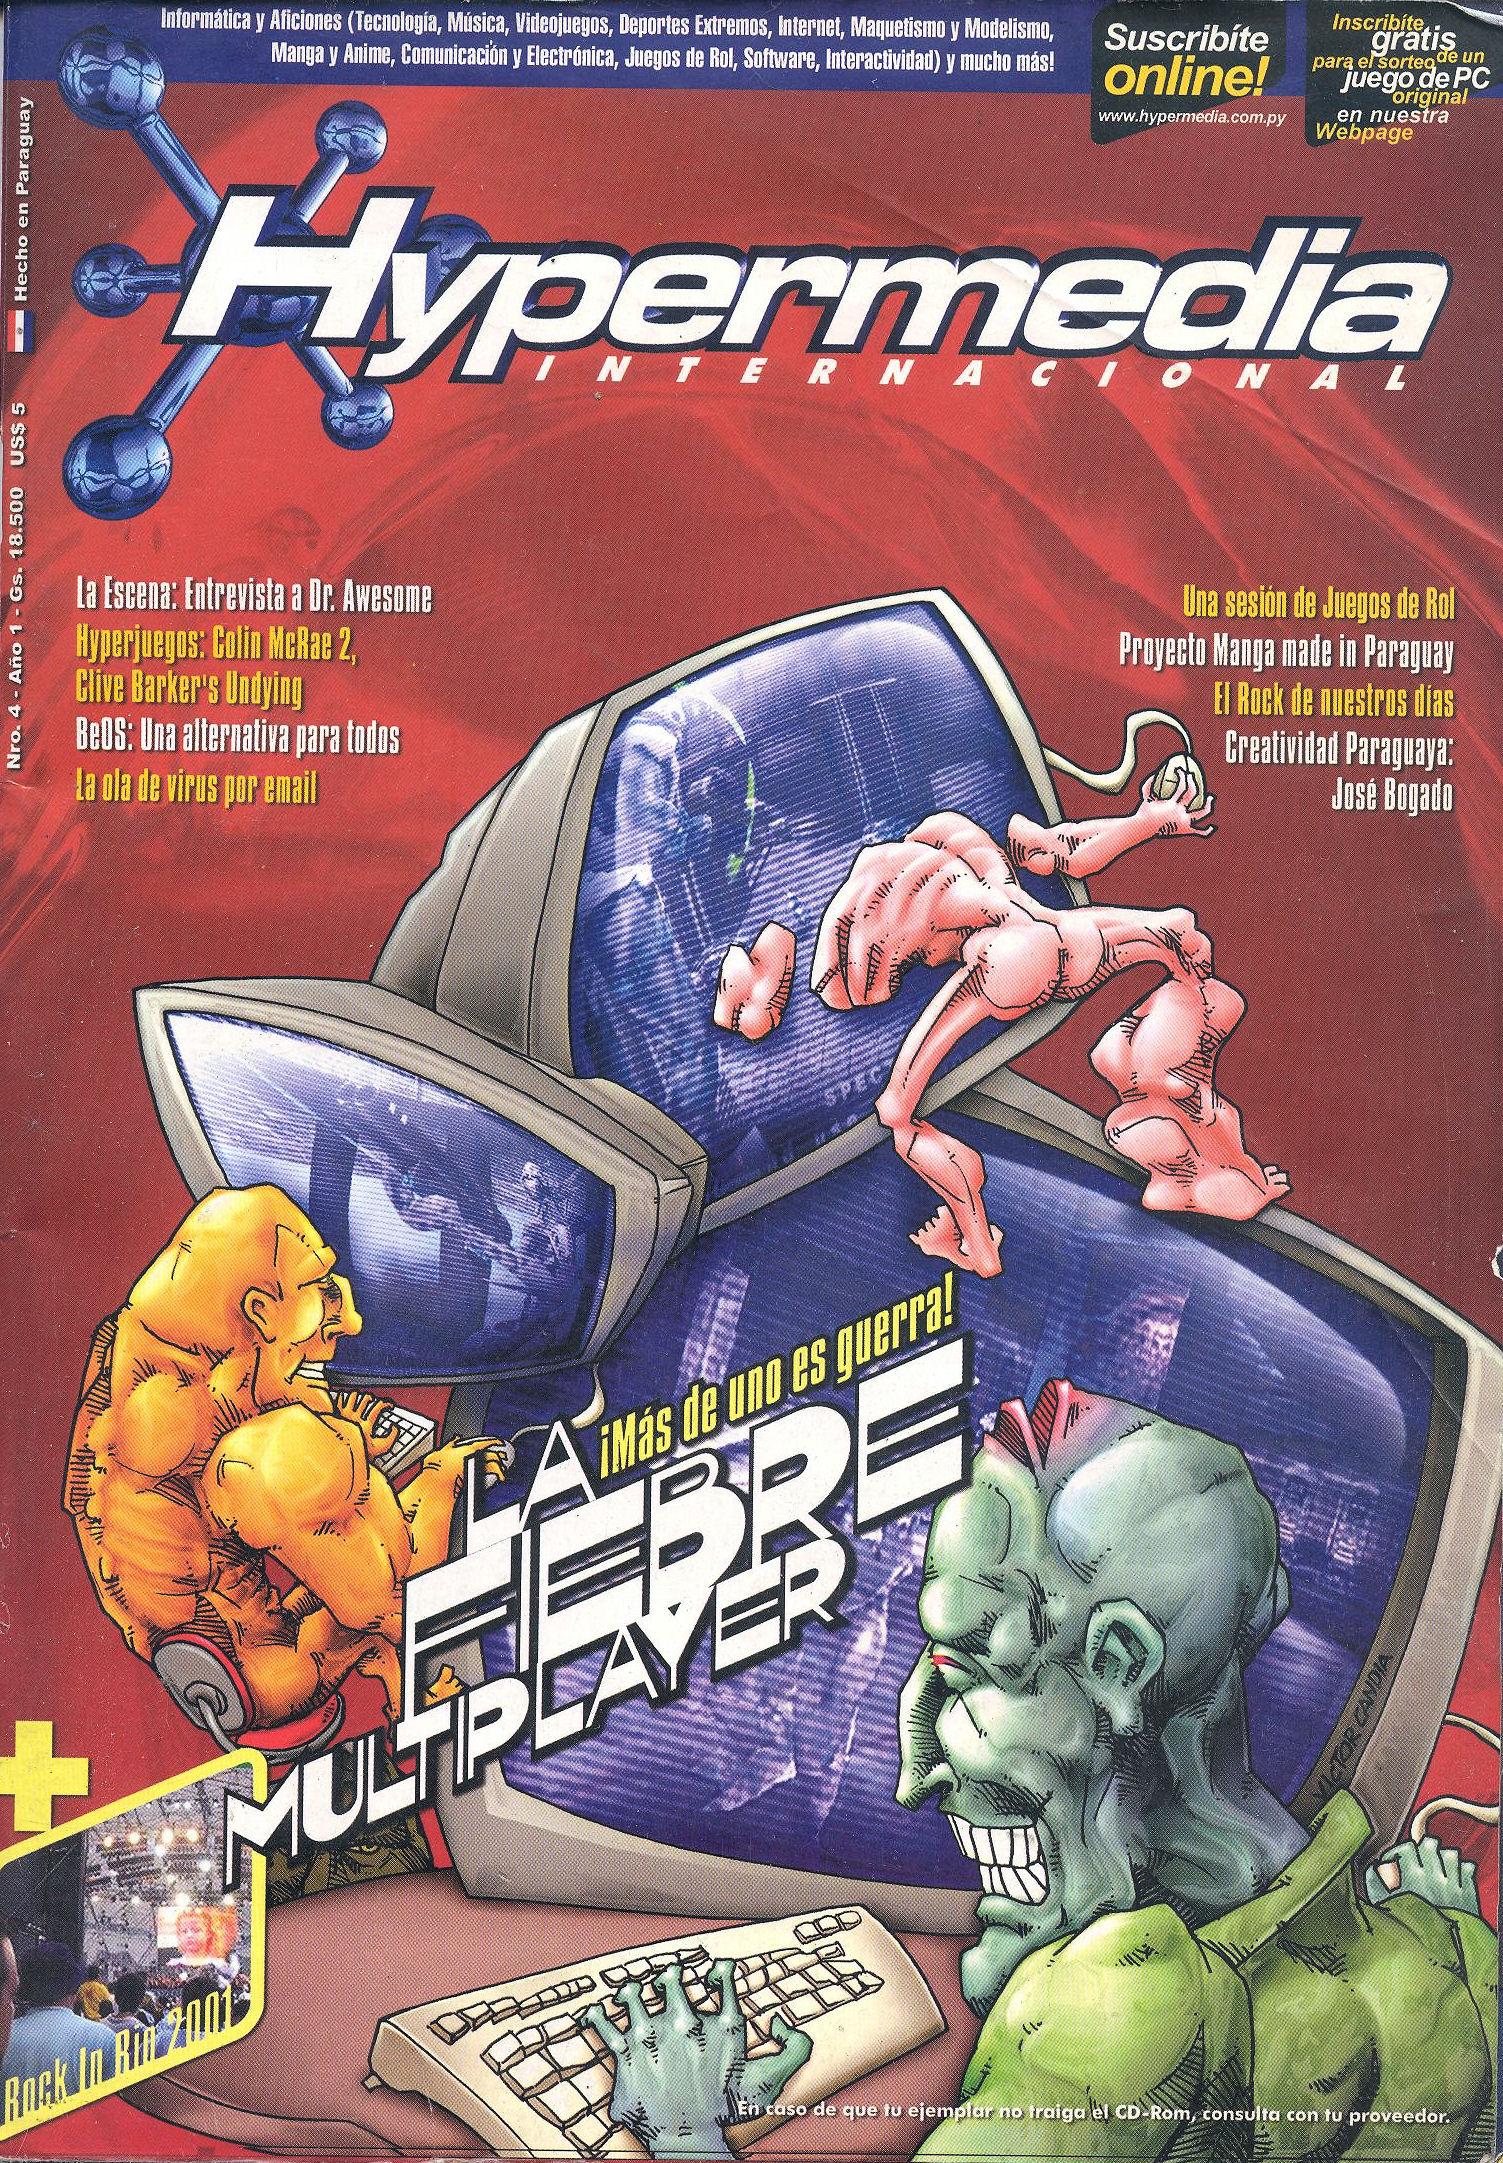 2001 Hypermedia 4